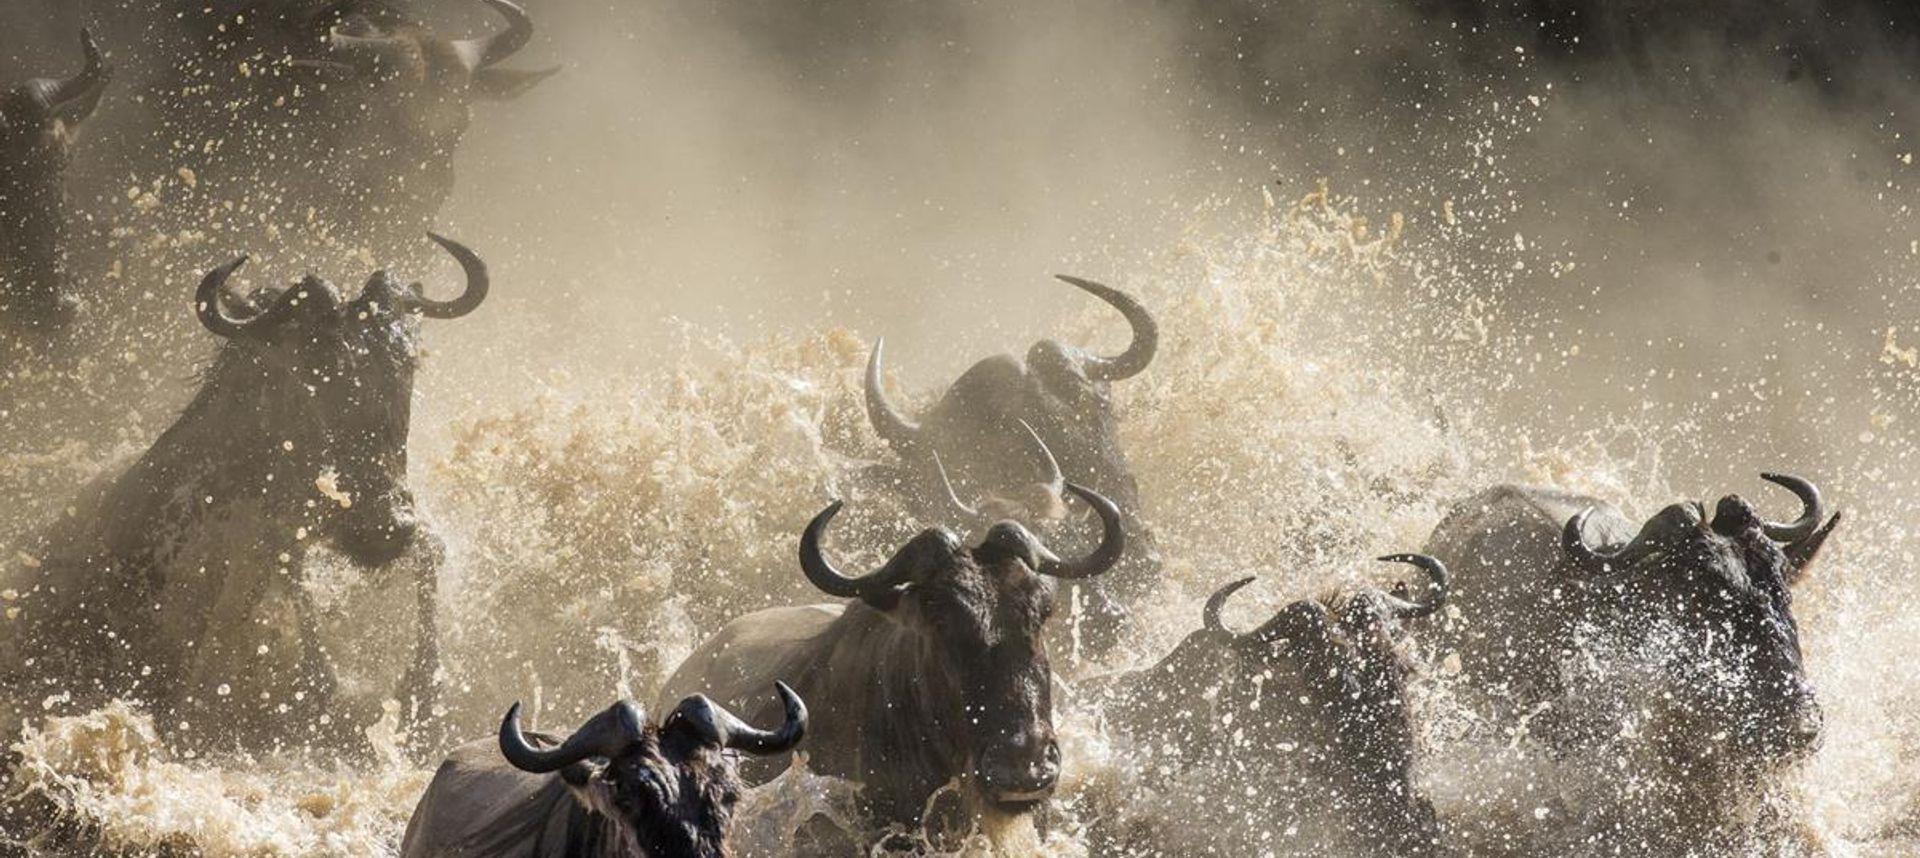 Big zebra herd during the great migration. Serengeti, Tanzania (dreamstime.com)